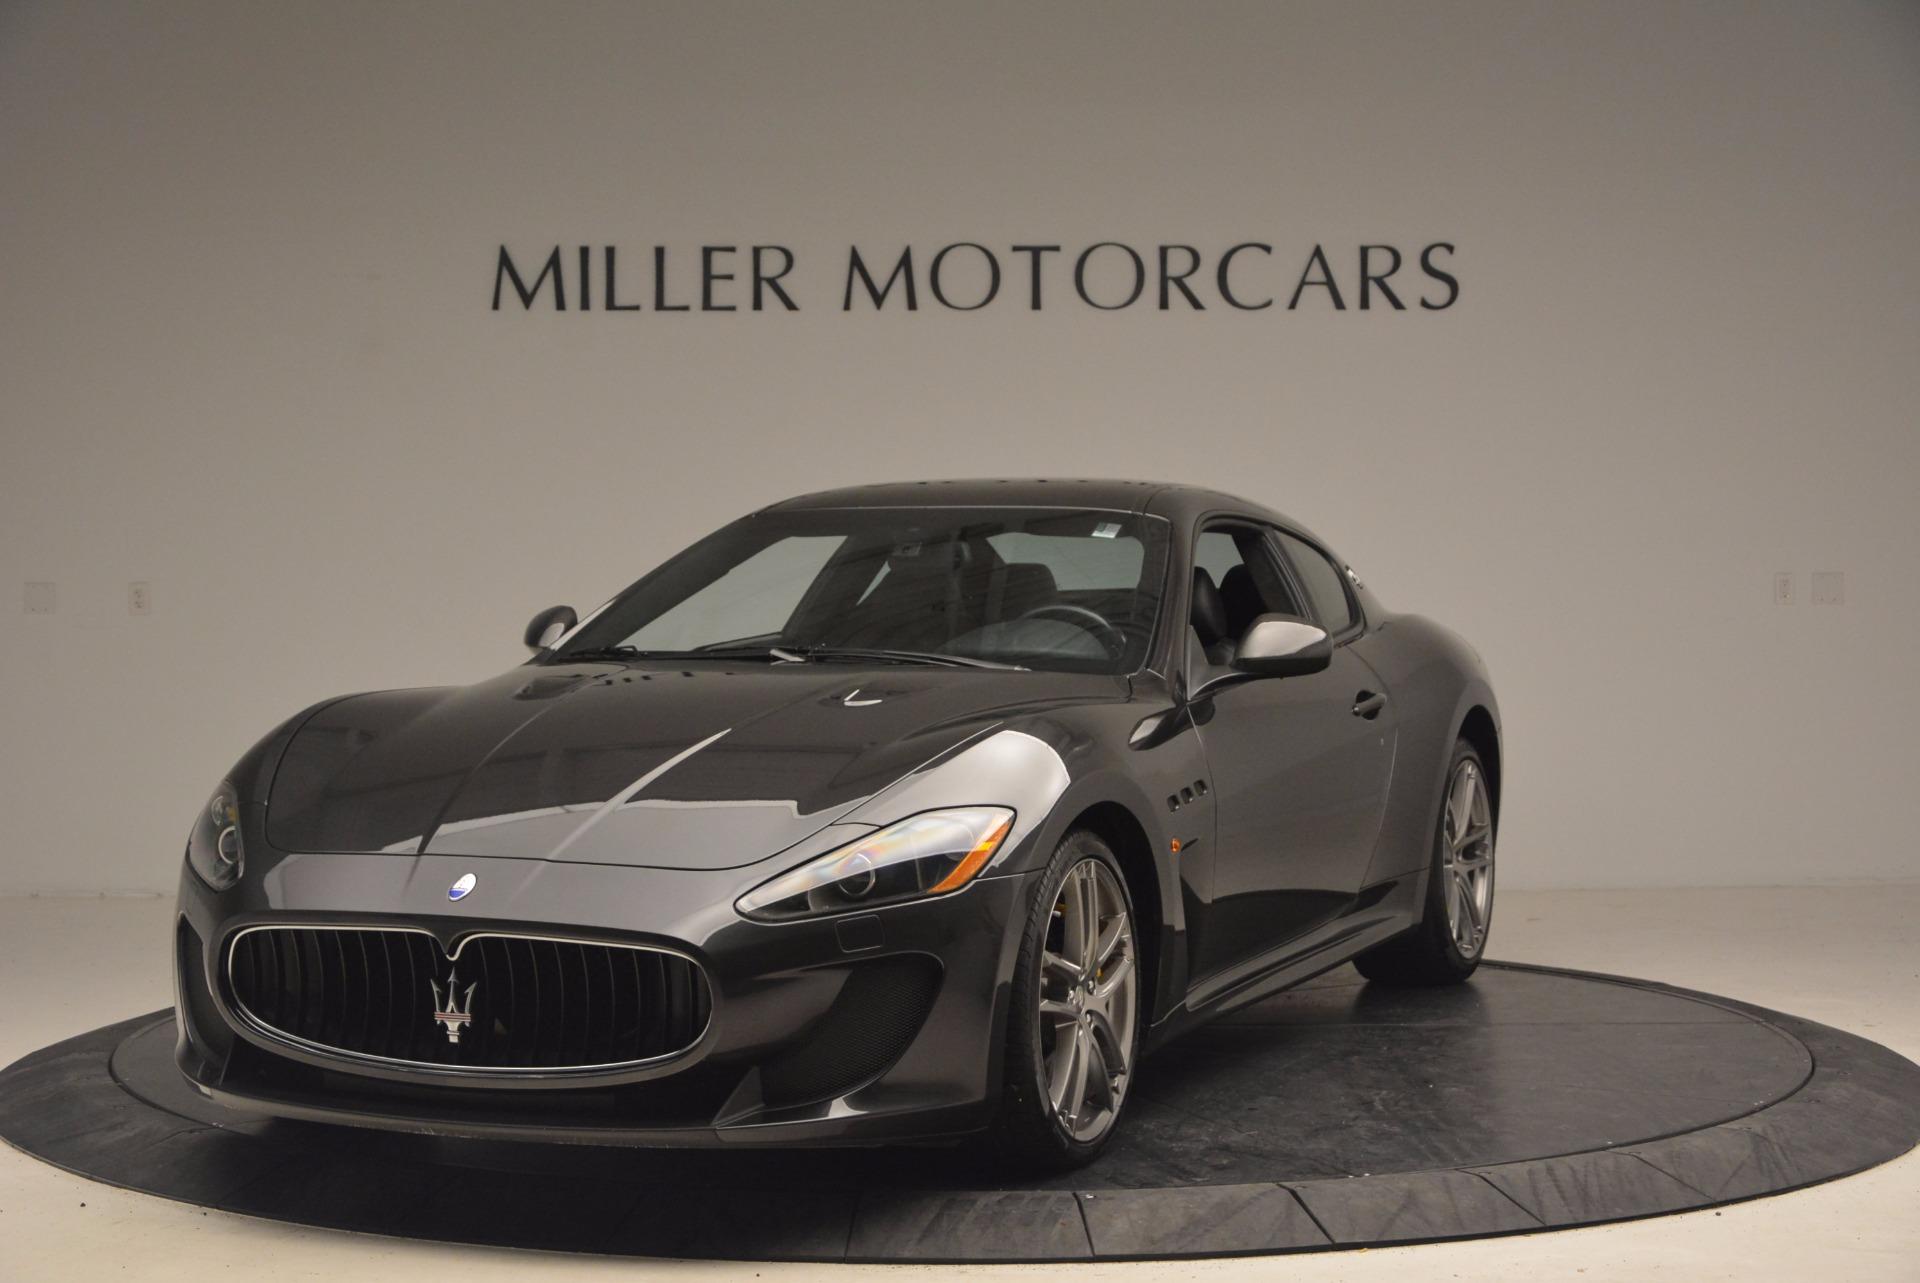 Used 2012 Maserati GranTurismo MC for sale Sold at Rolls-Royce Motor Cars Greenwich in Greenwich CT 06830 1